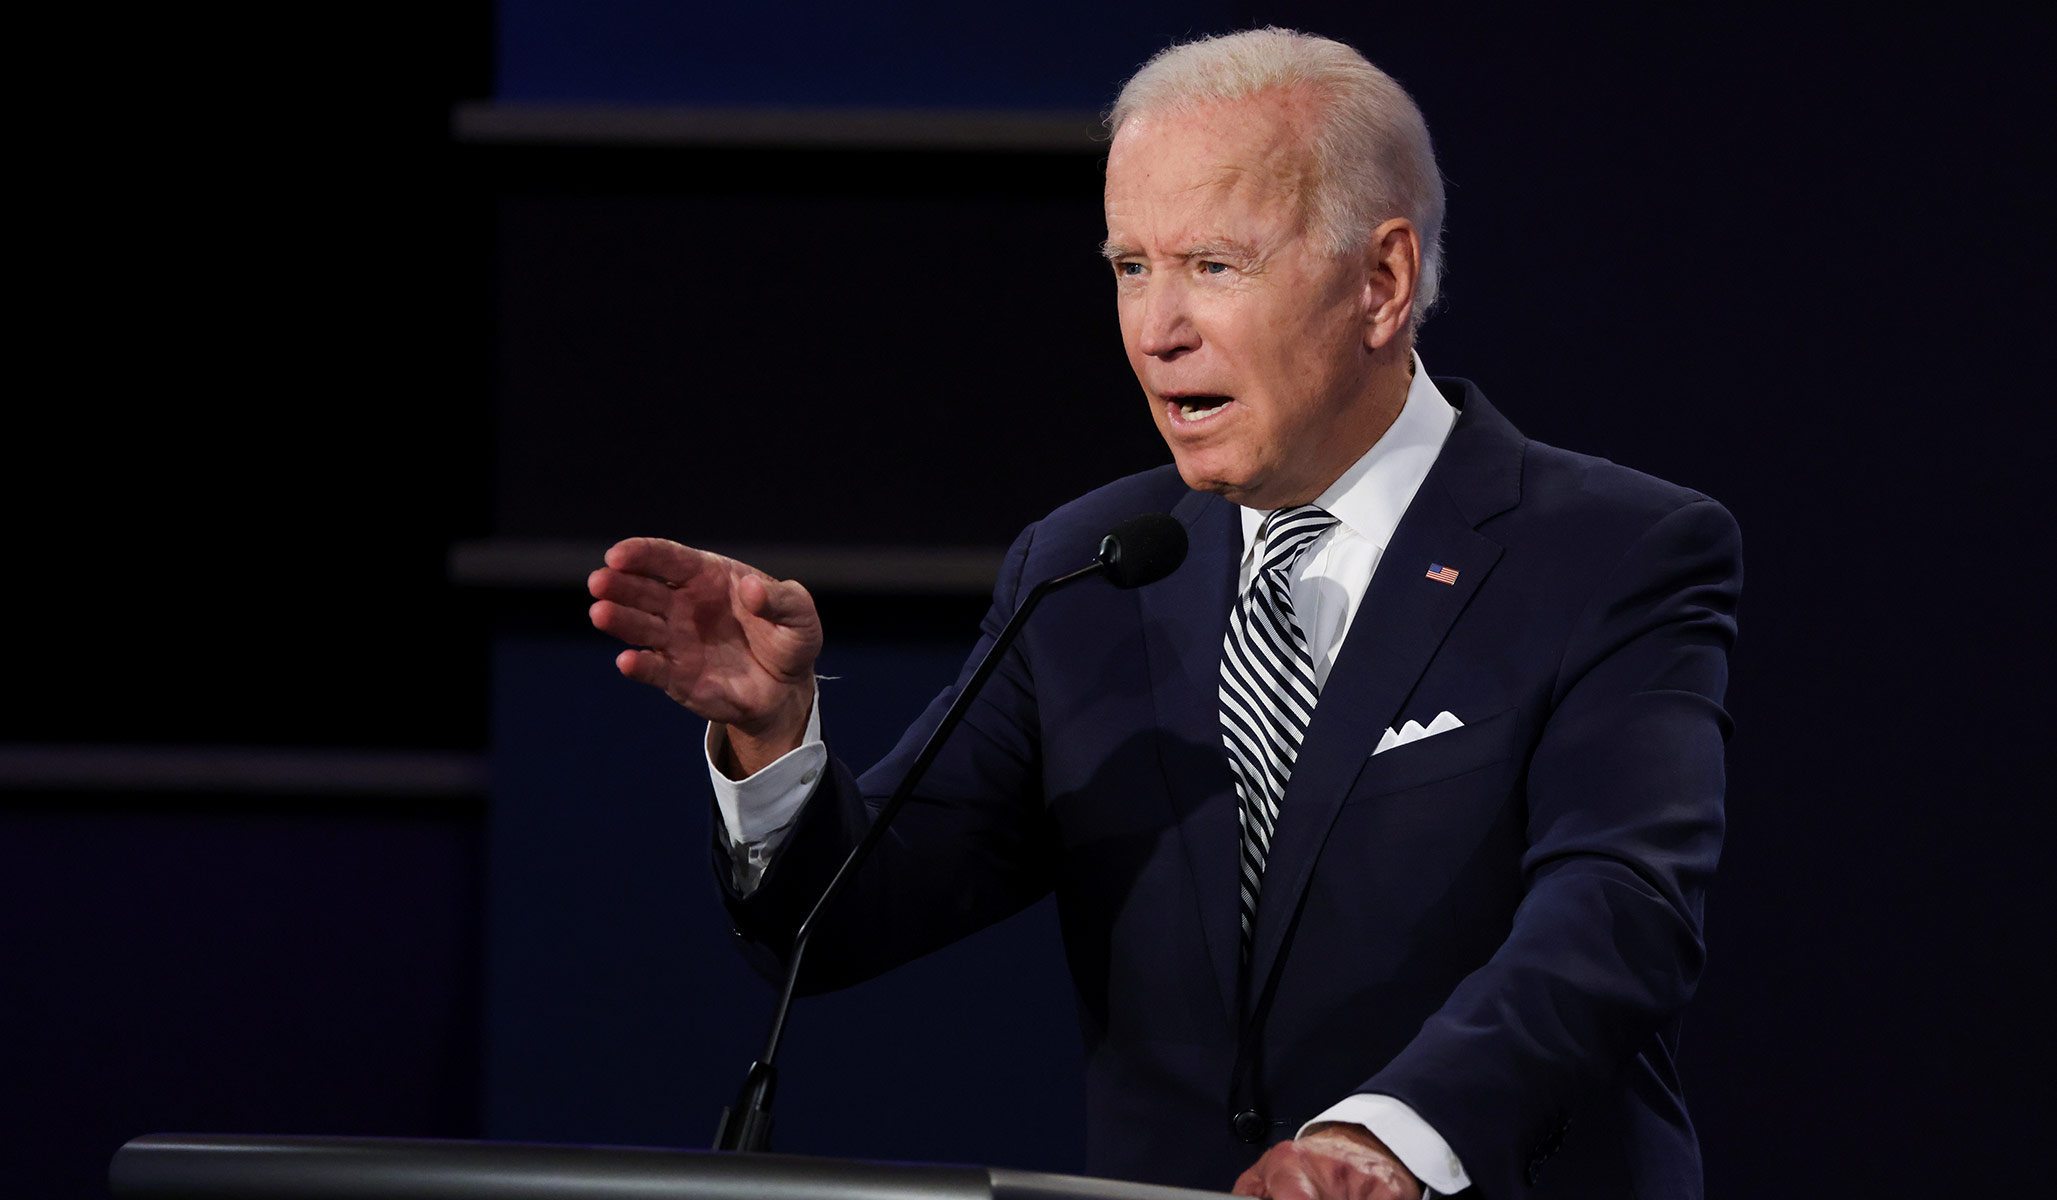 Biden Says Antifa is 'An Idea, Not An Organization' during Presidential Debate thumbnail